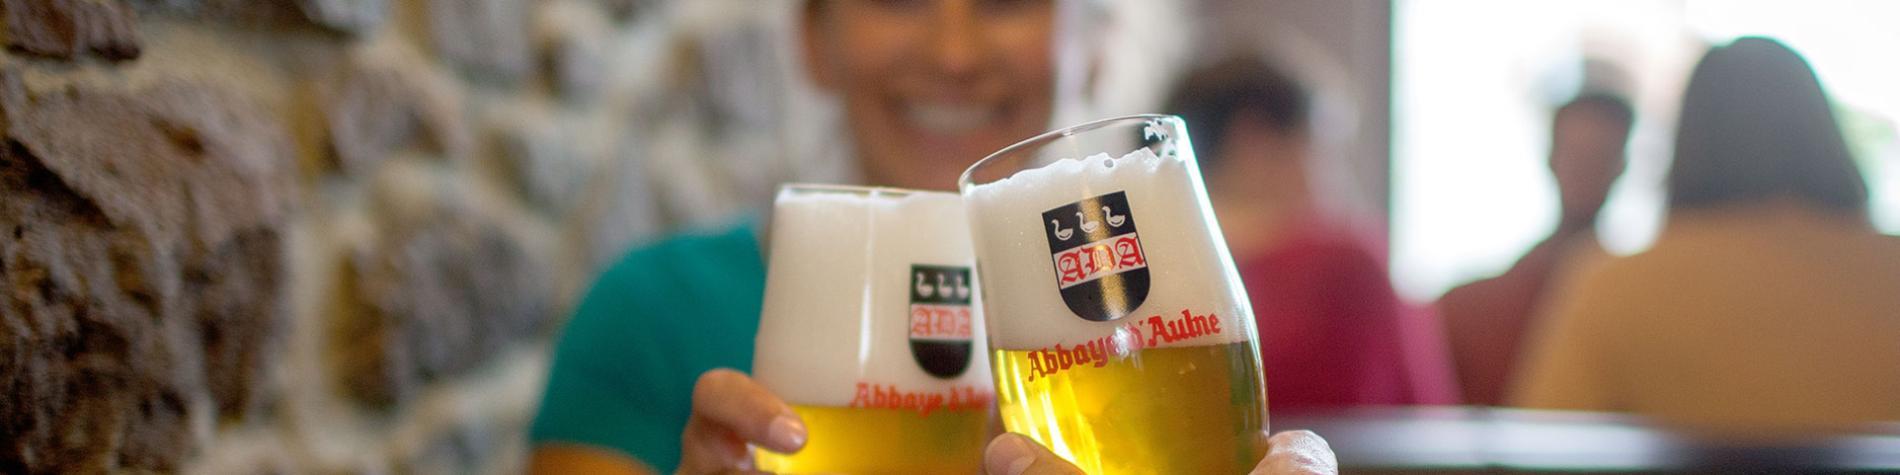 Thuin - au Beffroi Bar - Bière